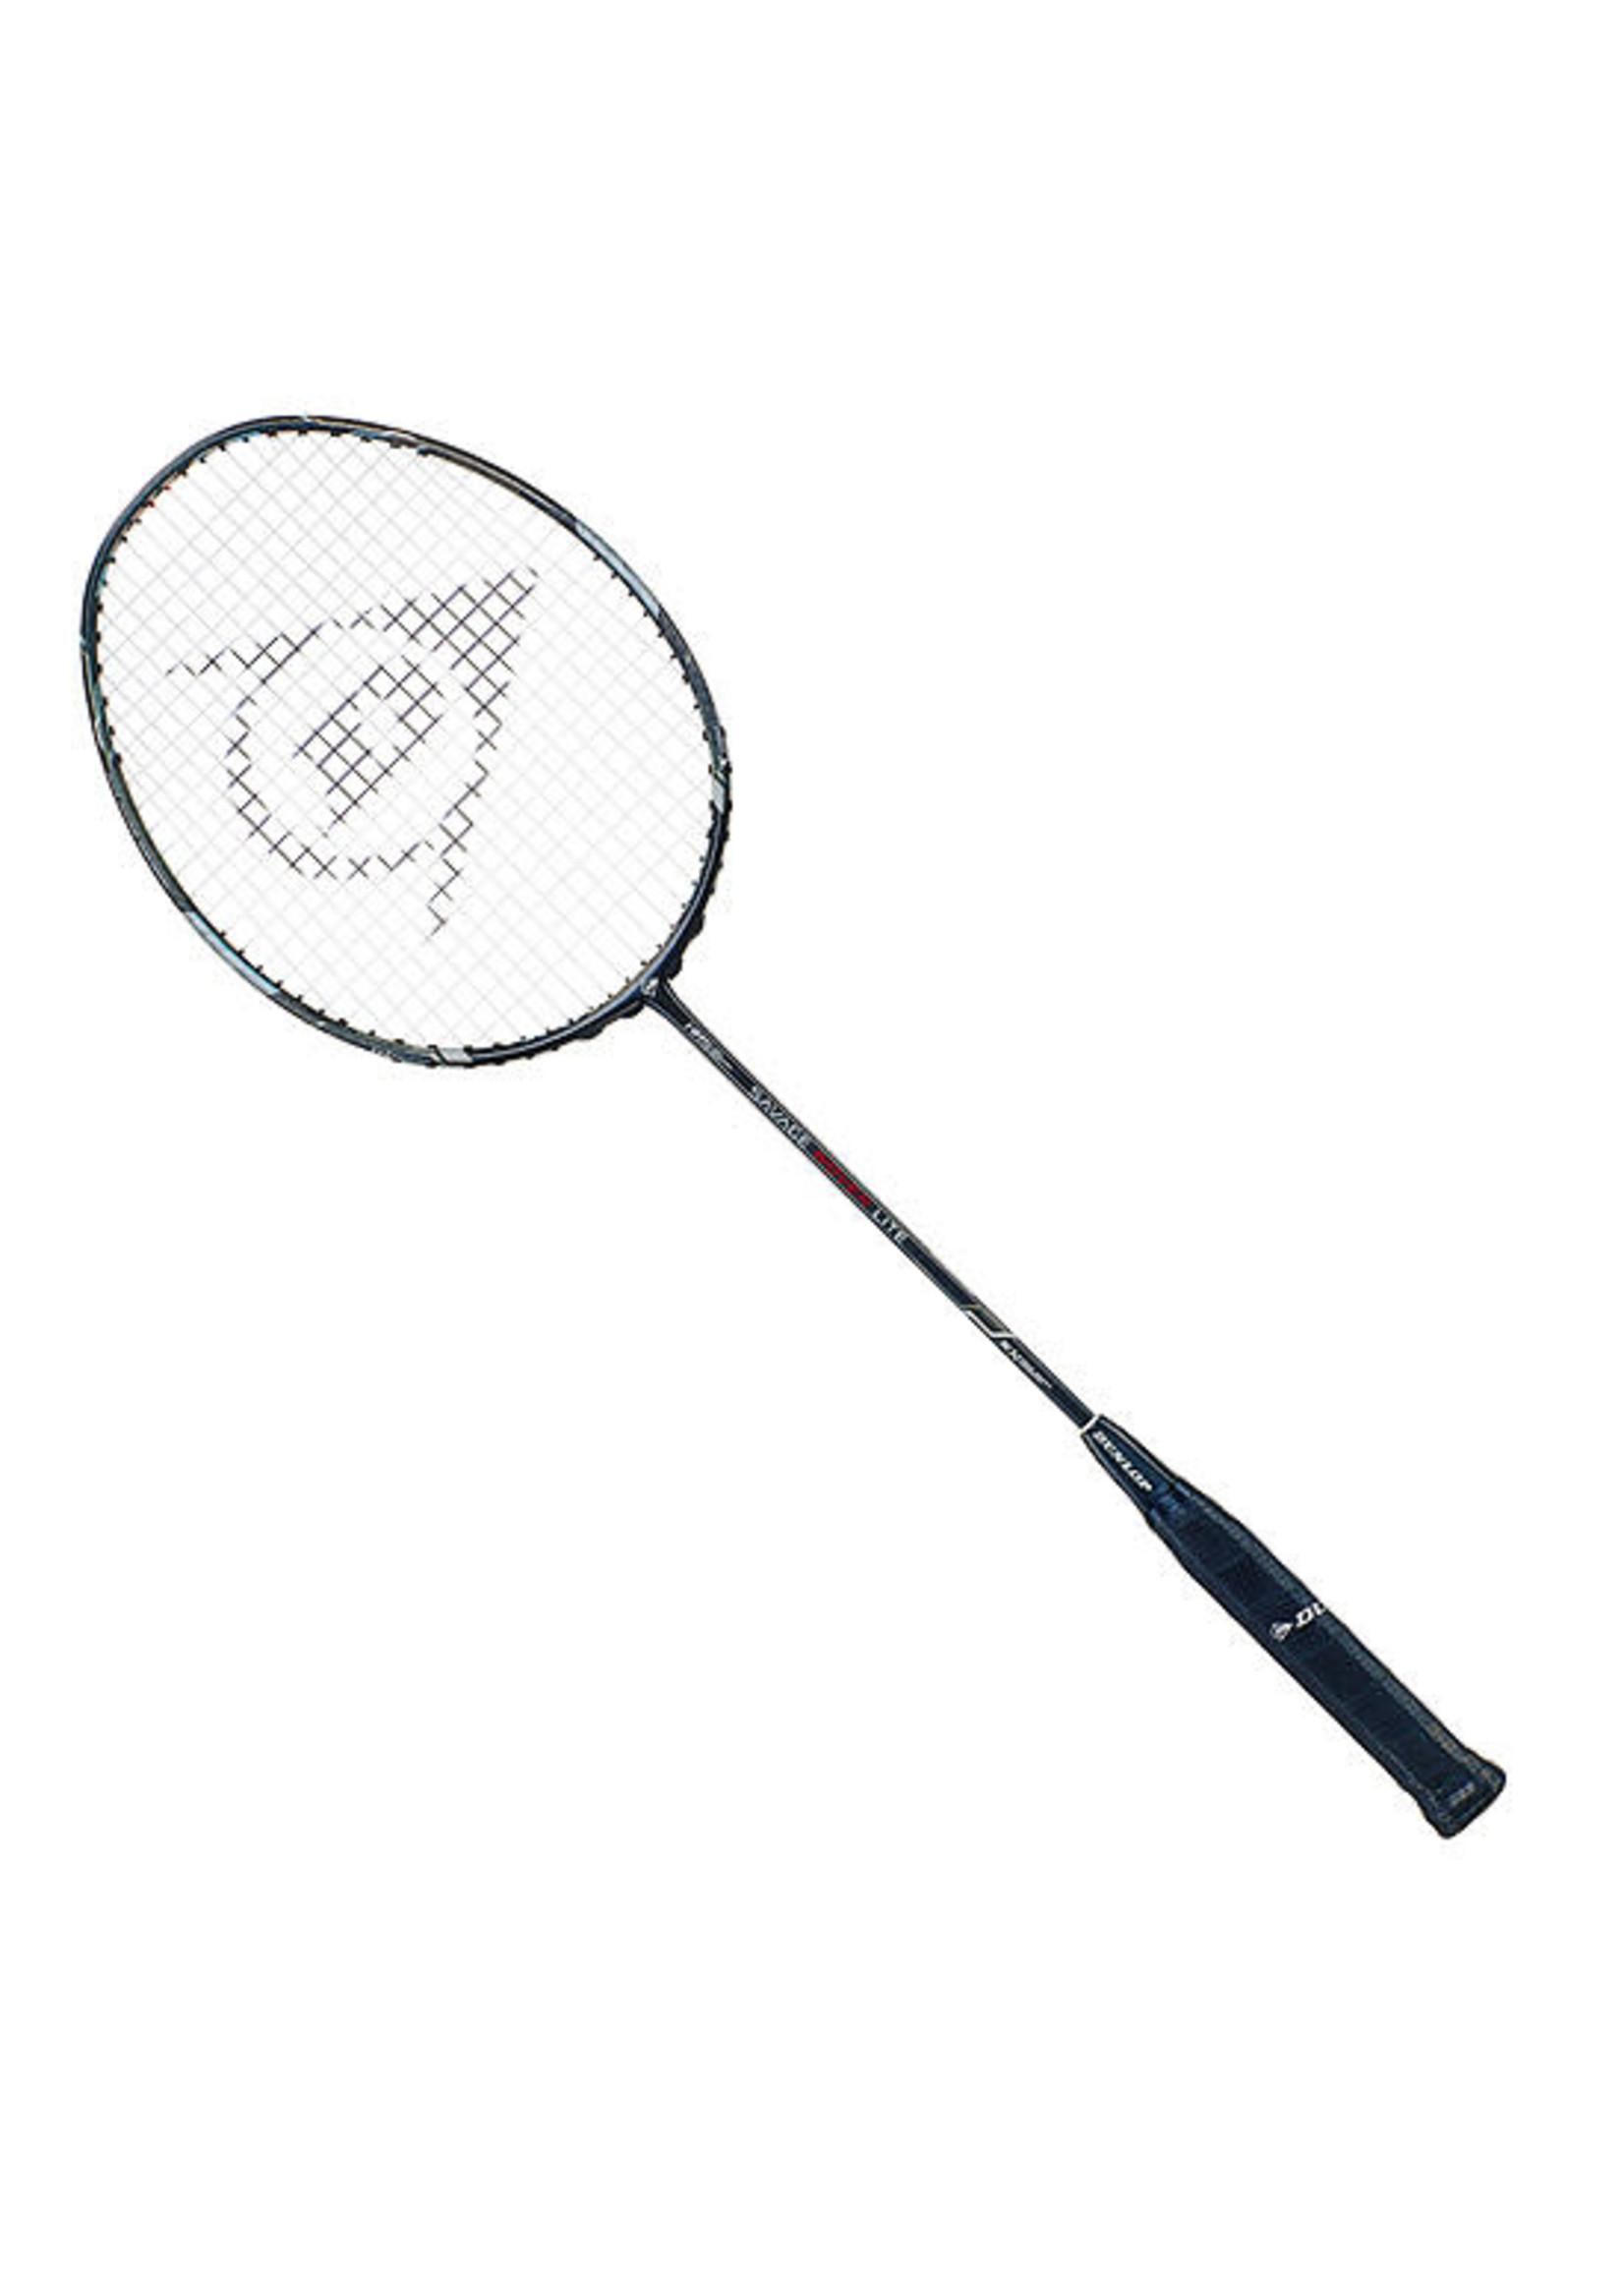 Dunlop Dunlop Nanoblade Savage Woven Lite Badminton Racket (2019)